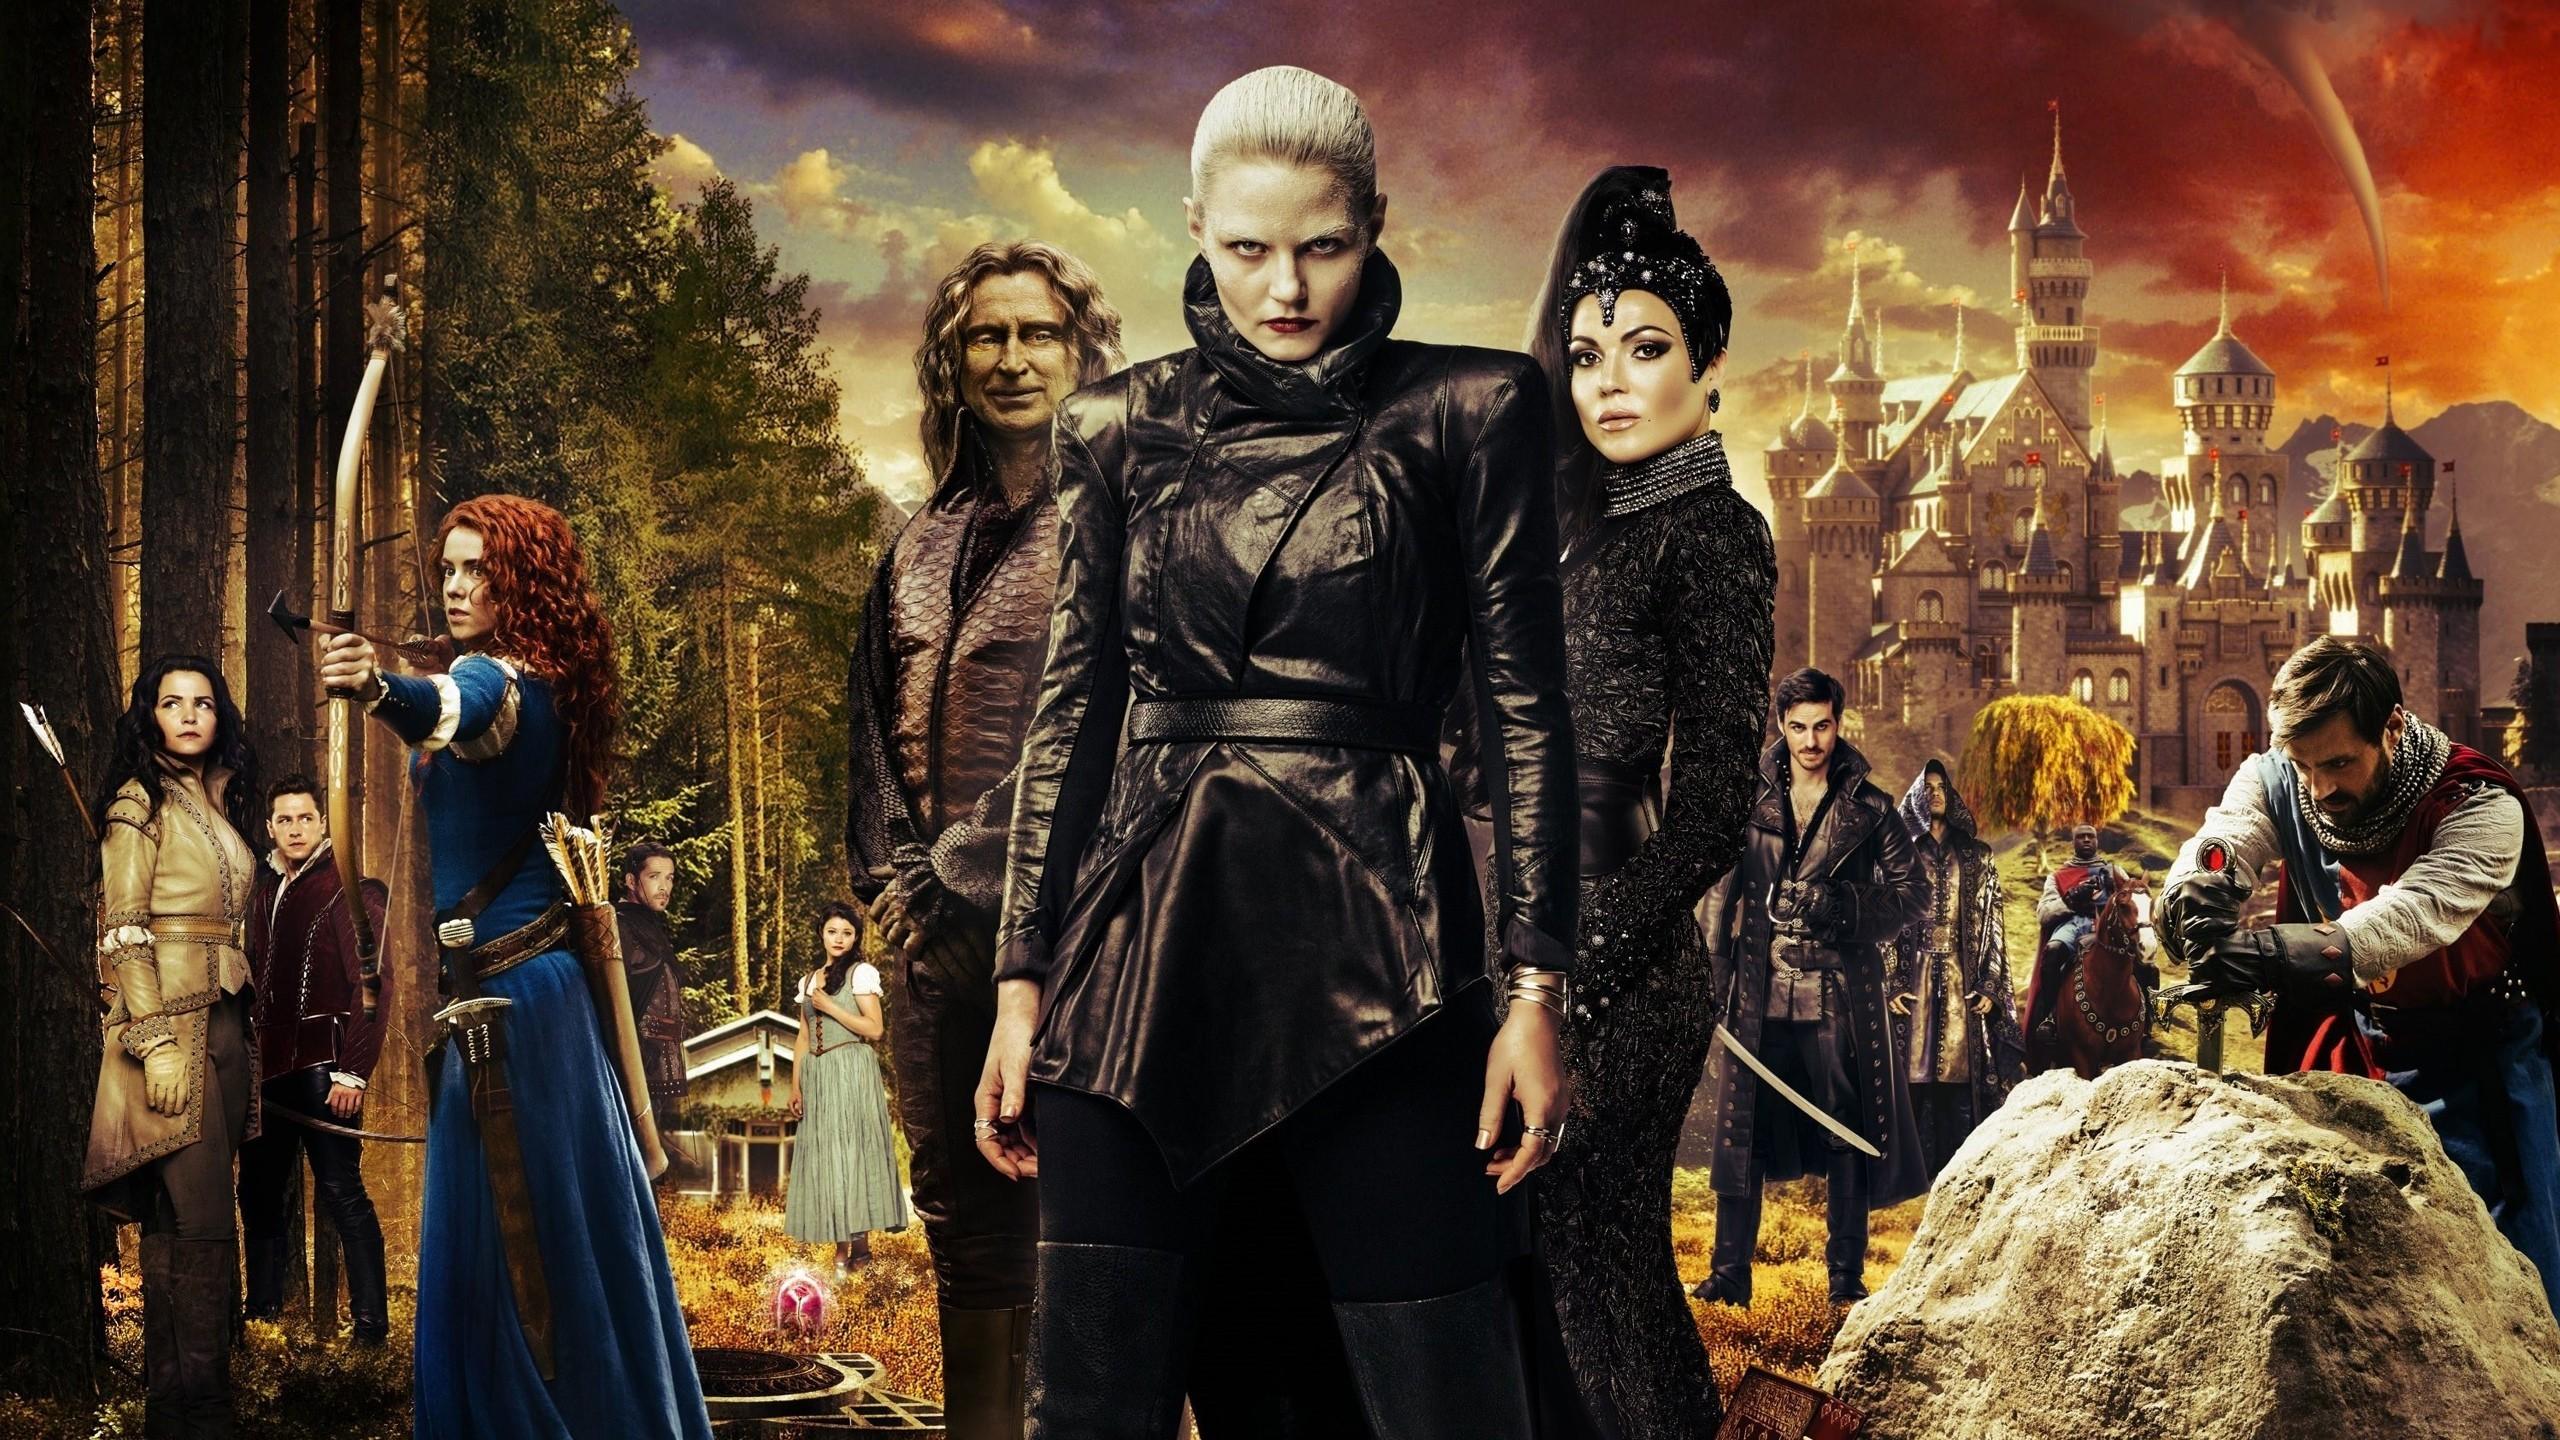 … x 1440 Original. Description: Download Once Upon a Time Season 5 TV  Series wallpaper …